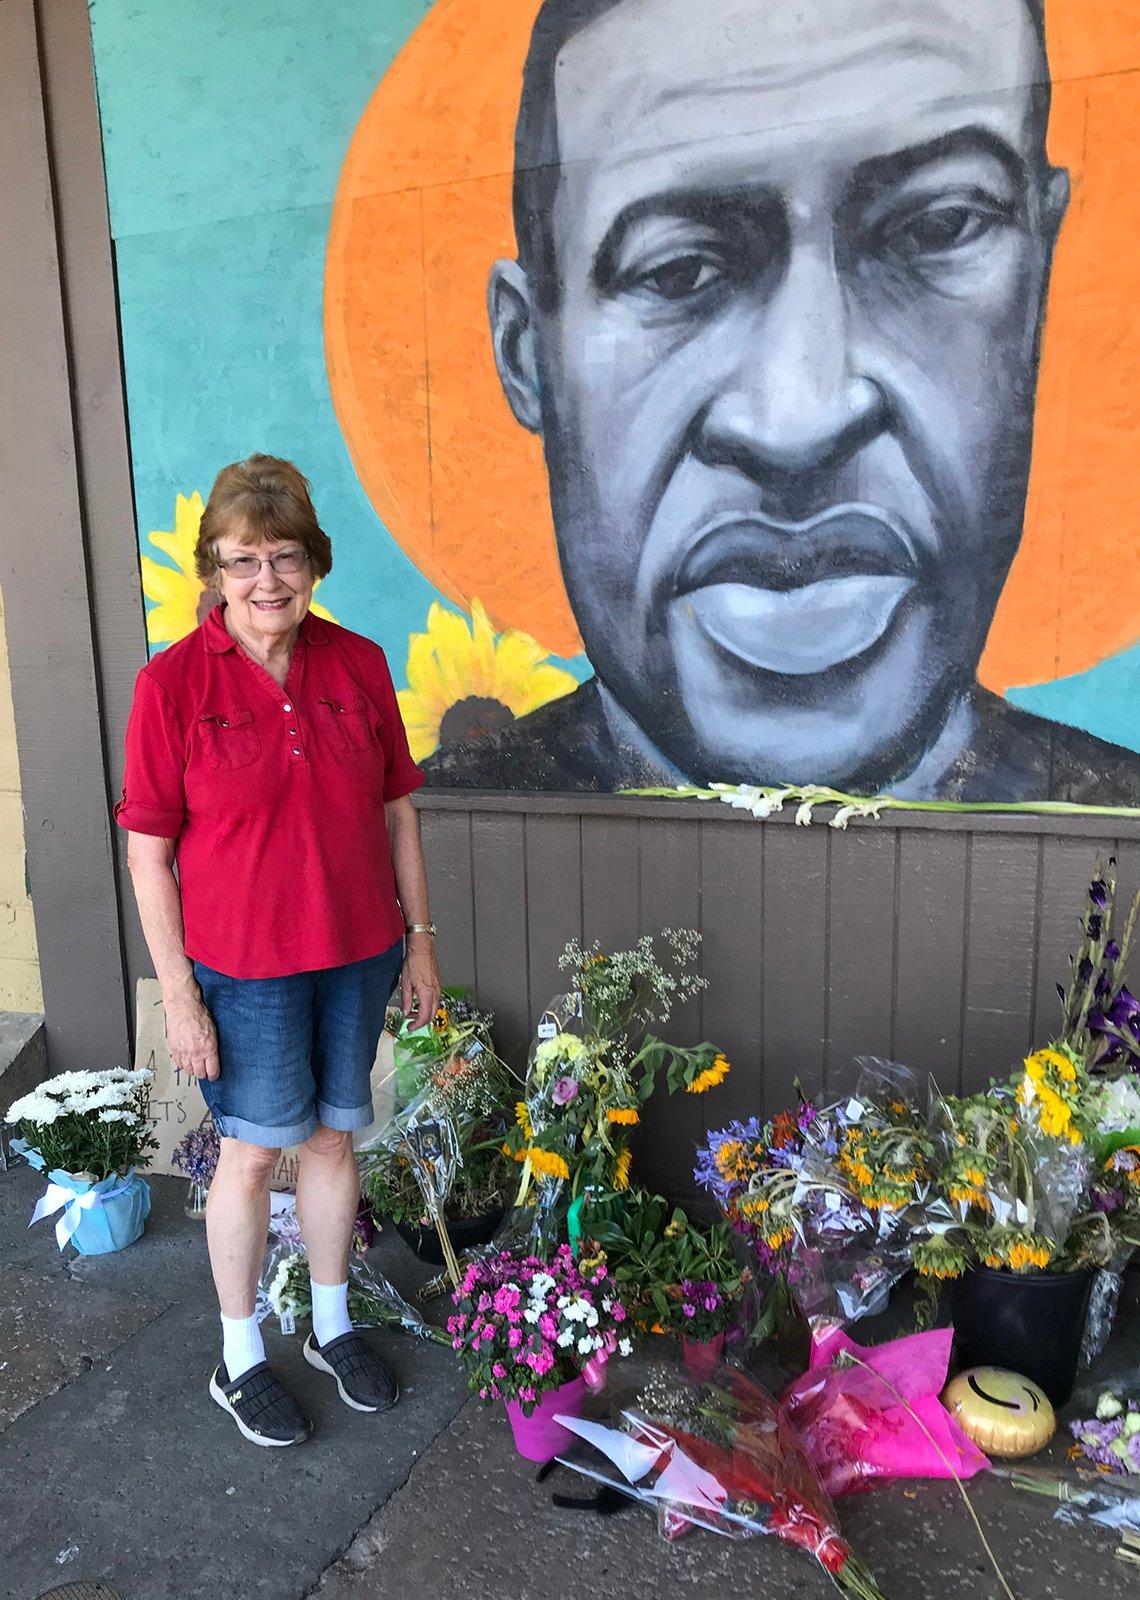 Lois Knowlton frente a un mural conmemorativo de George Floyd